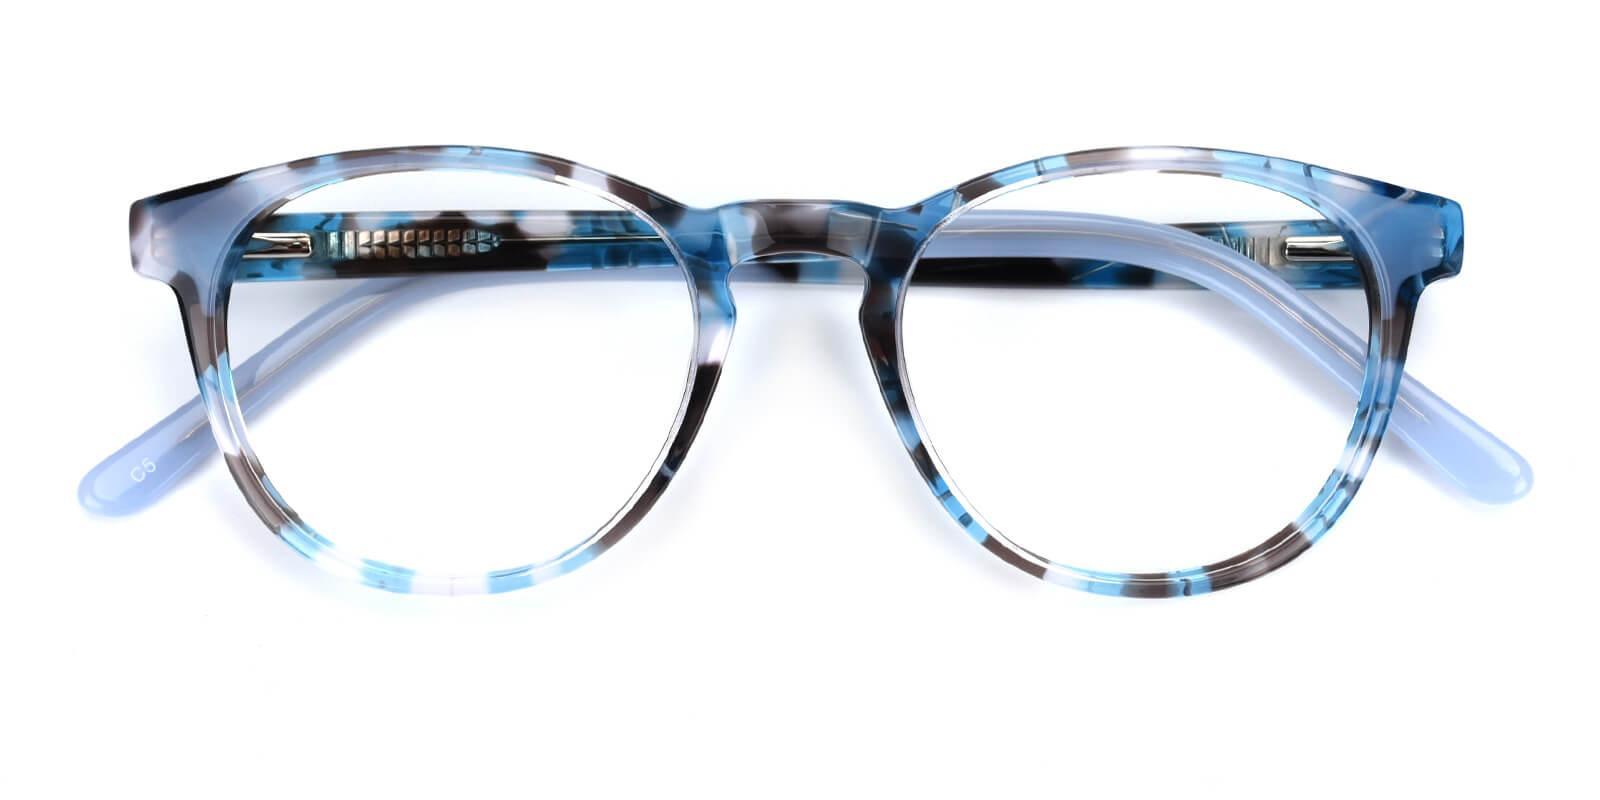 Debbine-Blue-Oval-Acetate-Eyeglasses-detail